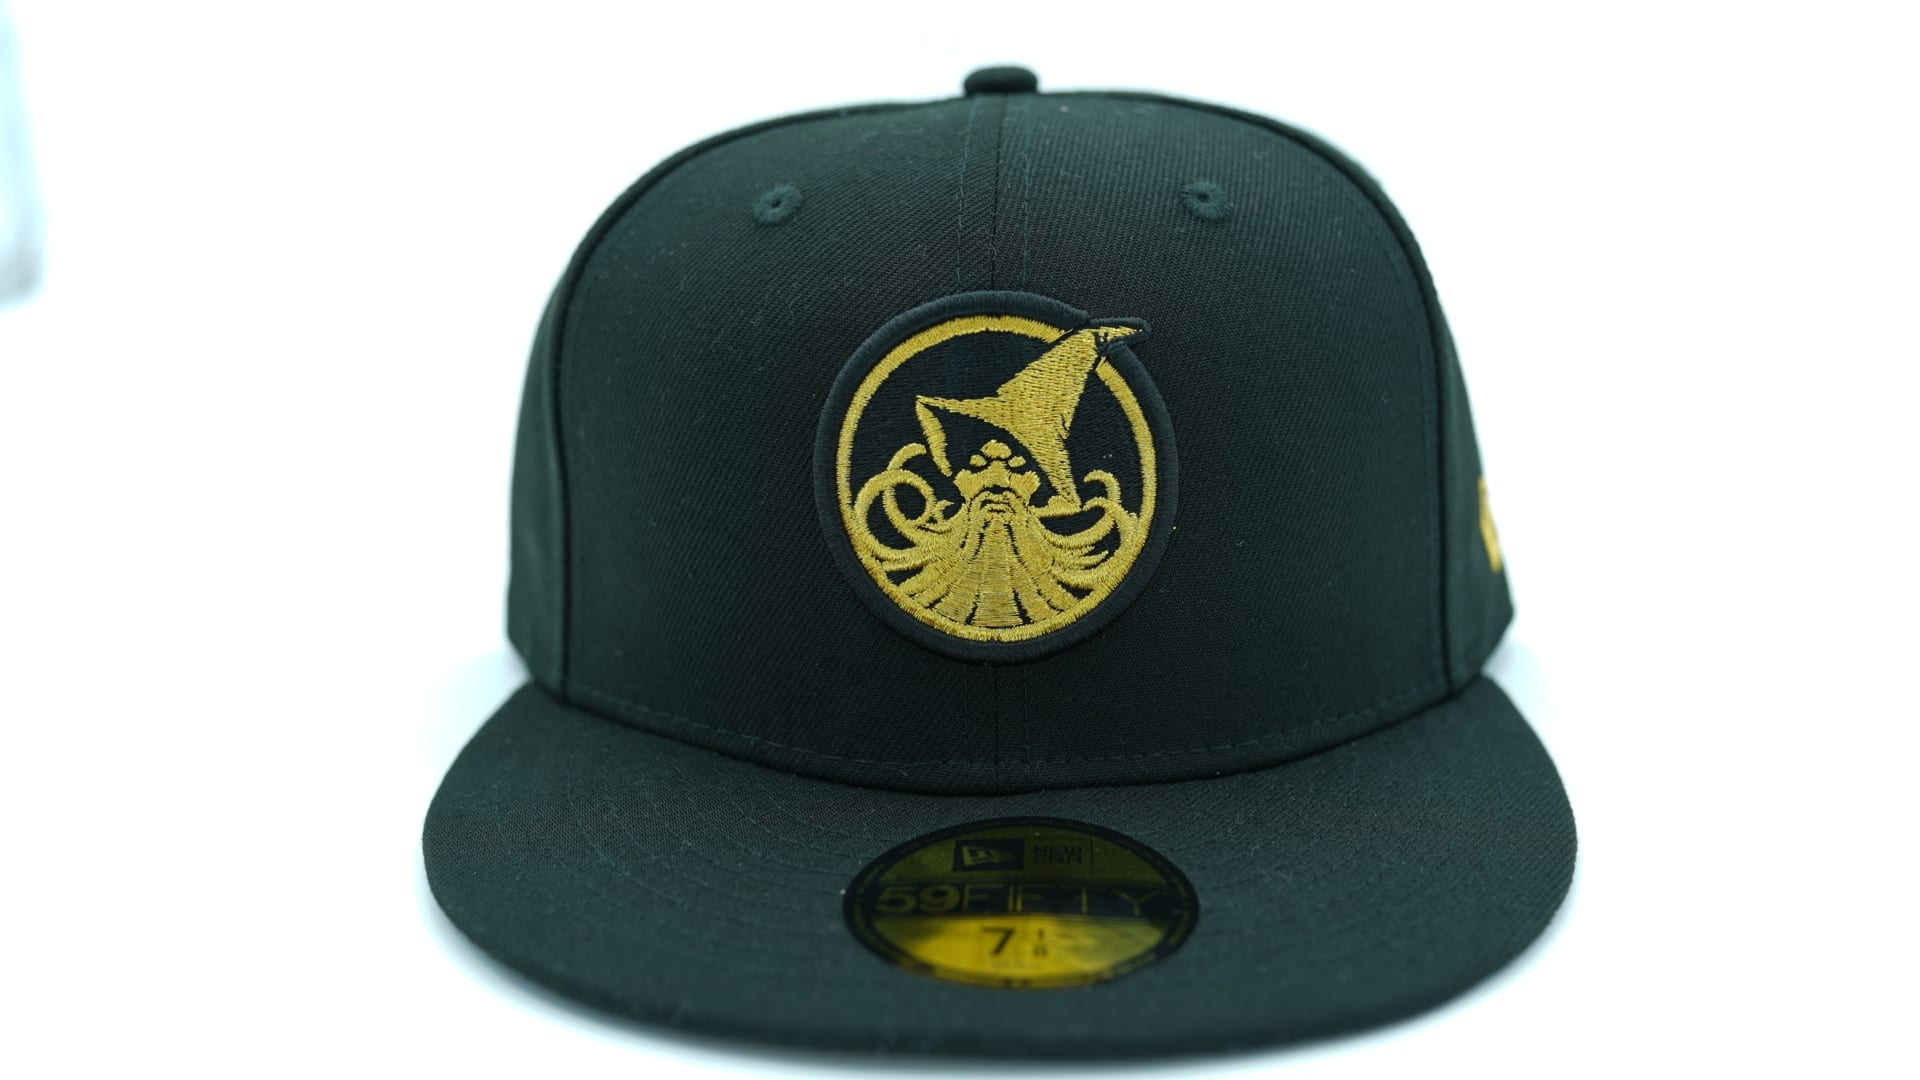 golden state warriors jordan 13 retro bred 59fifty fitted baseball cap new era nba